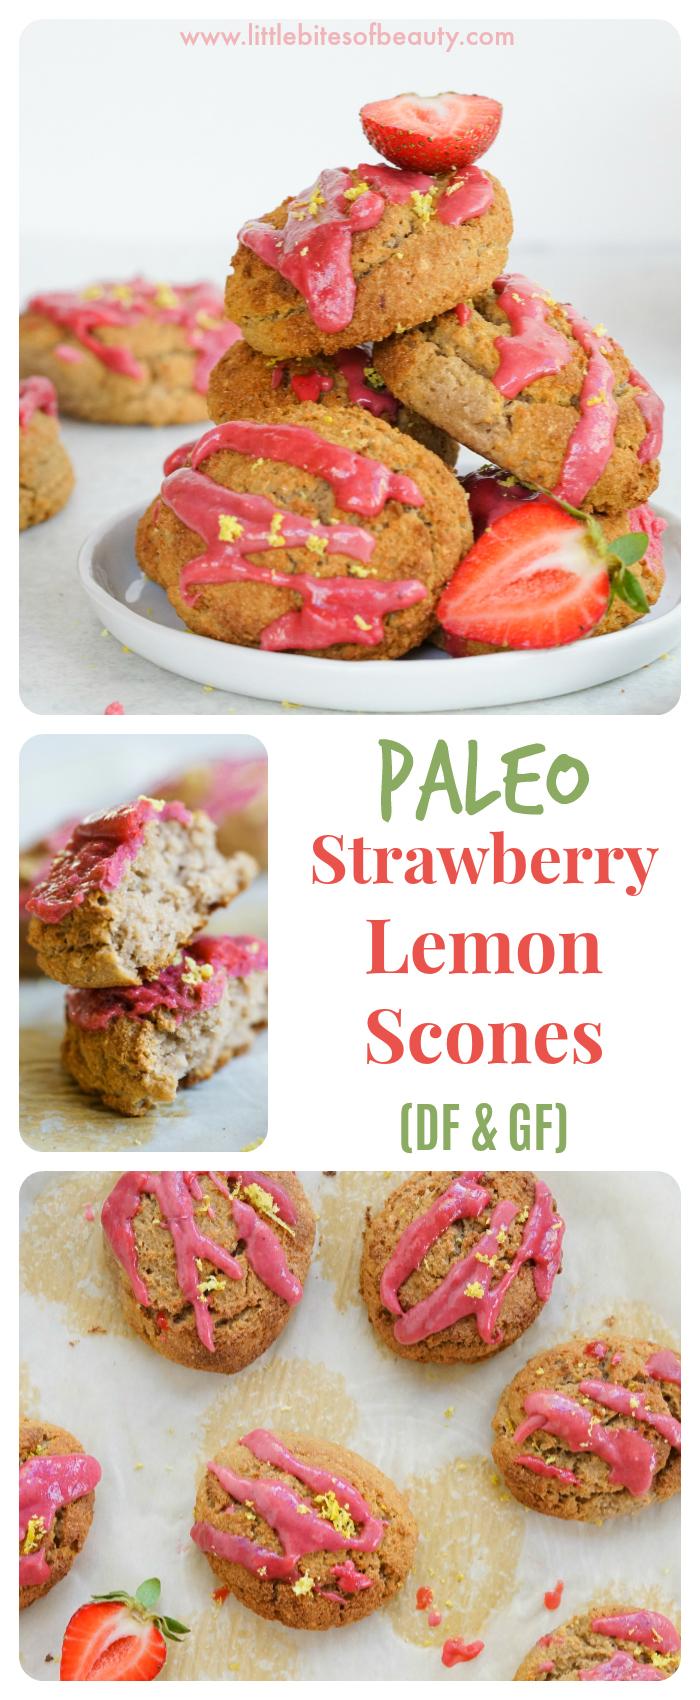 Paleo Strawberry Lemon Scones (Dairy & Gluten Free)